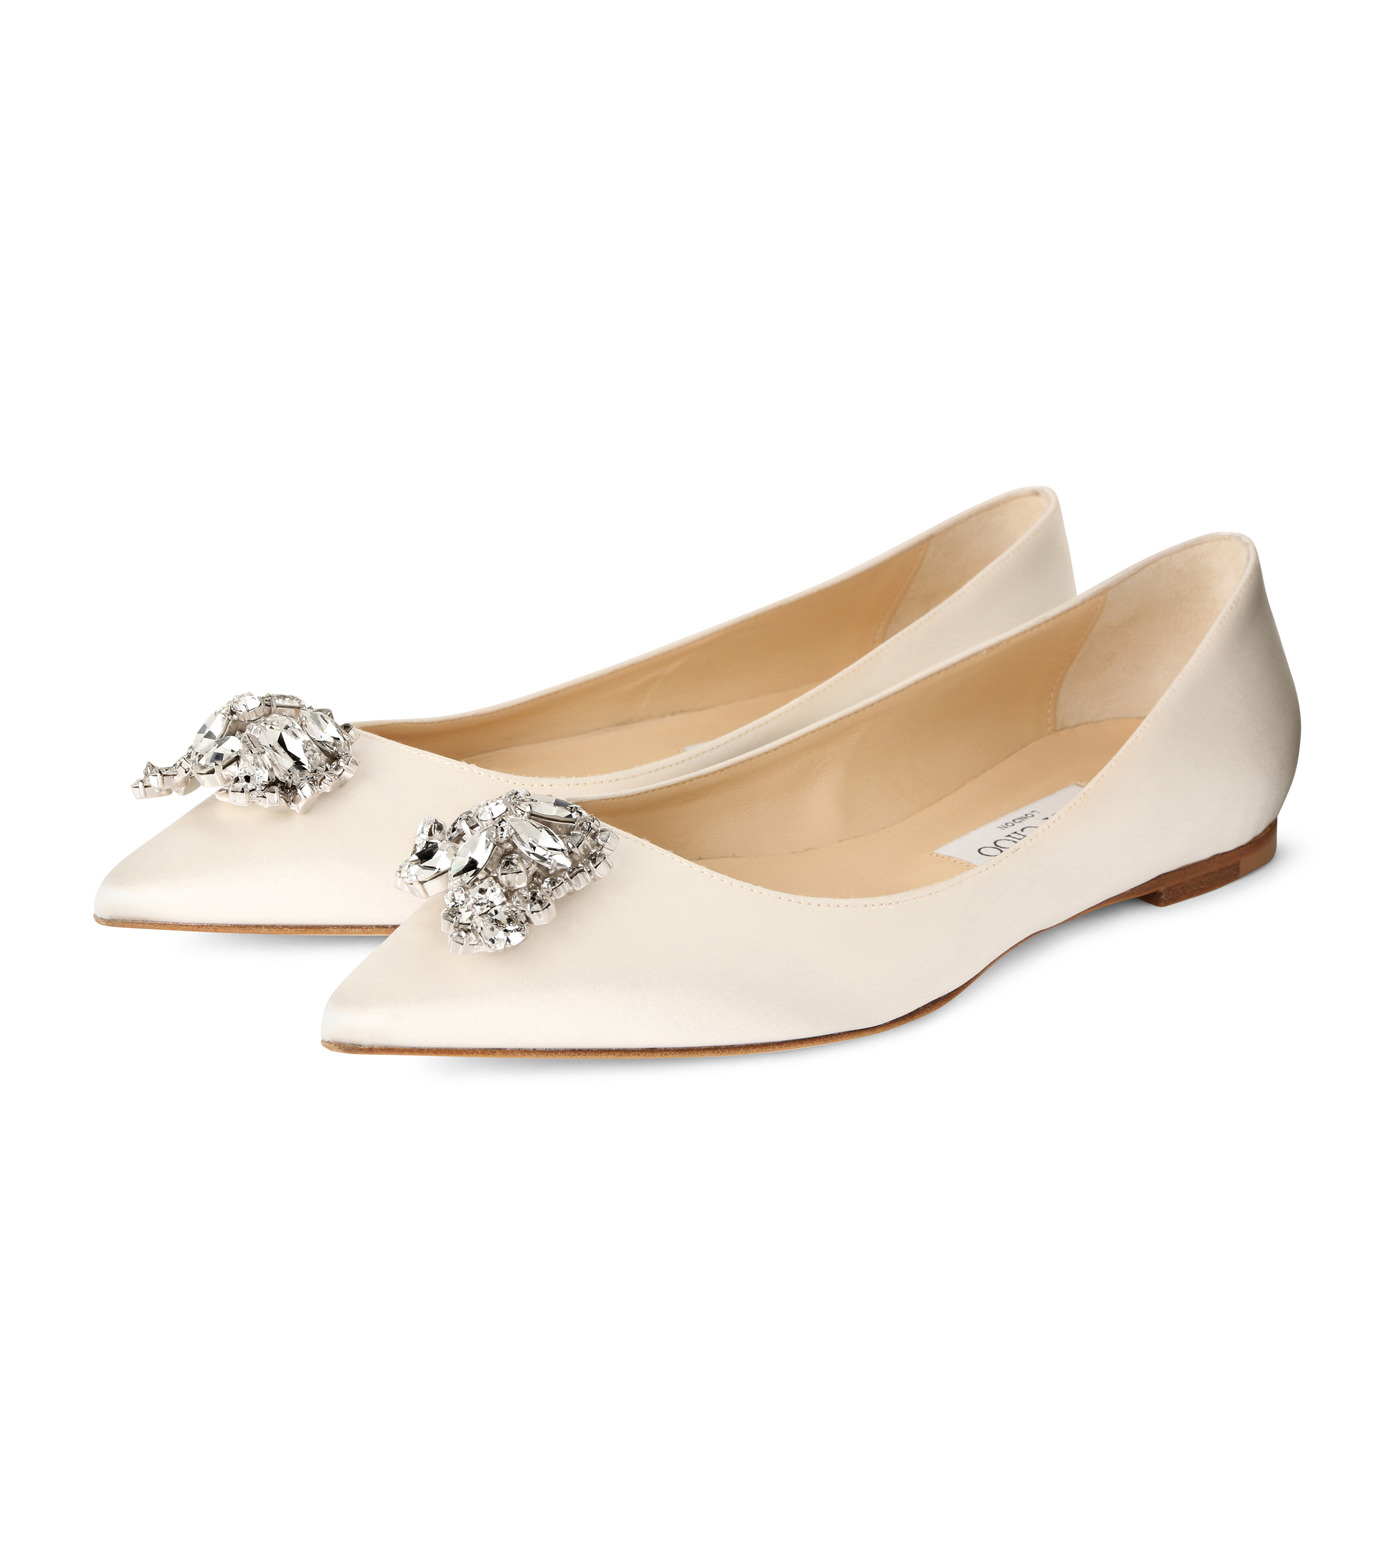 Jimmy Choo(ジミーチュウ)の010STV Satin Flat w/Crystal Brooch-WHITE(フラットシューズ/Flat shoes)-ALINA-5 拡大詳細画像3